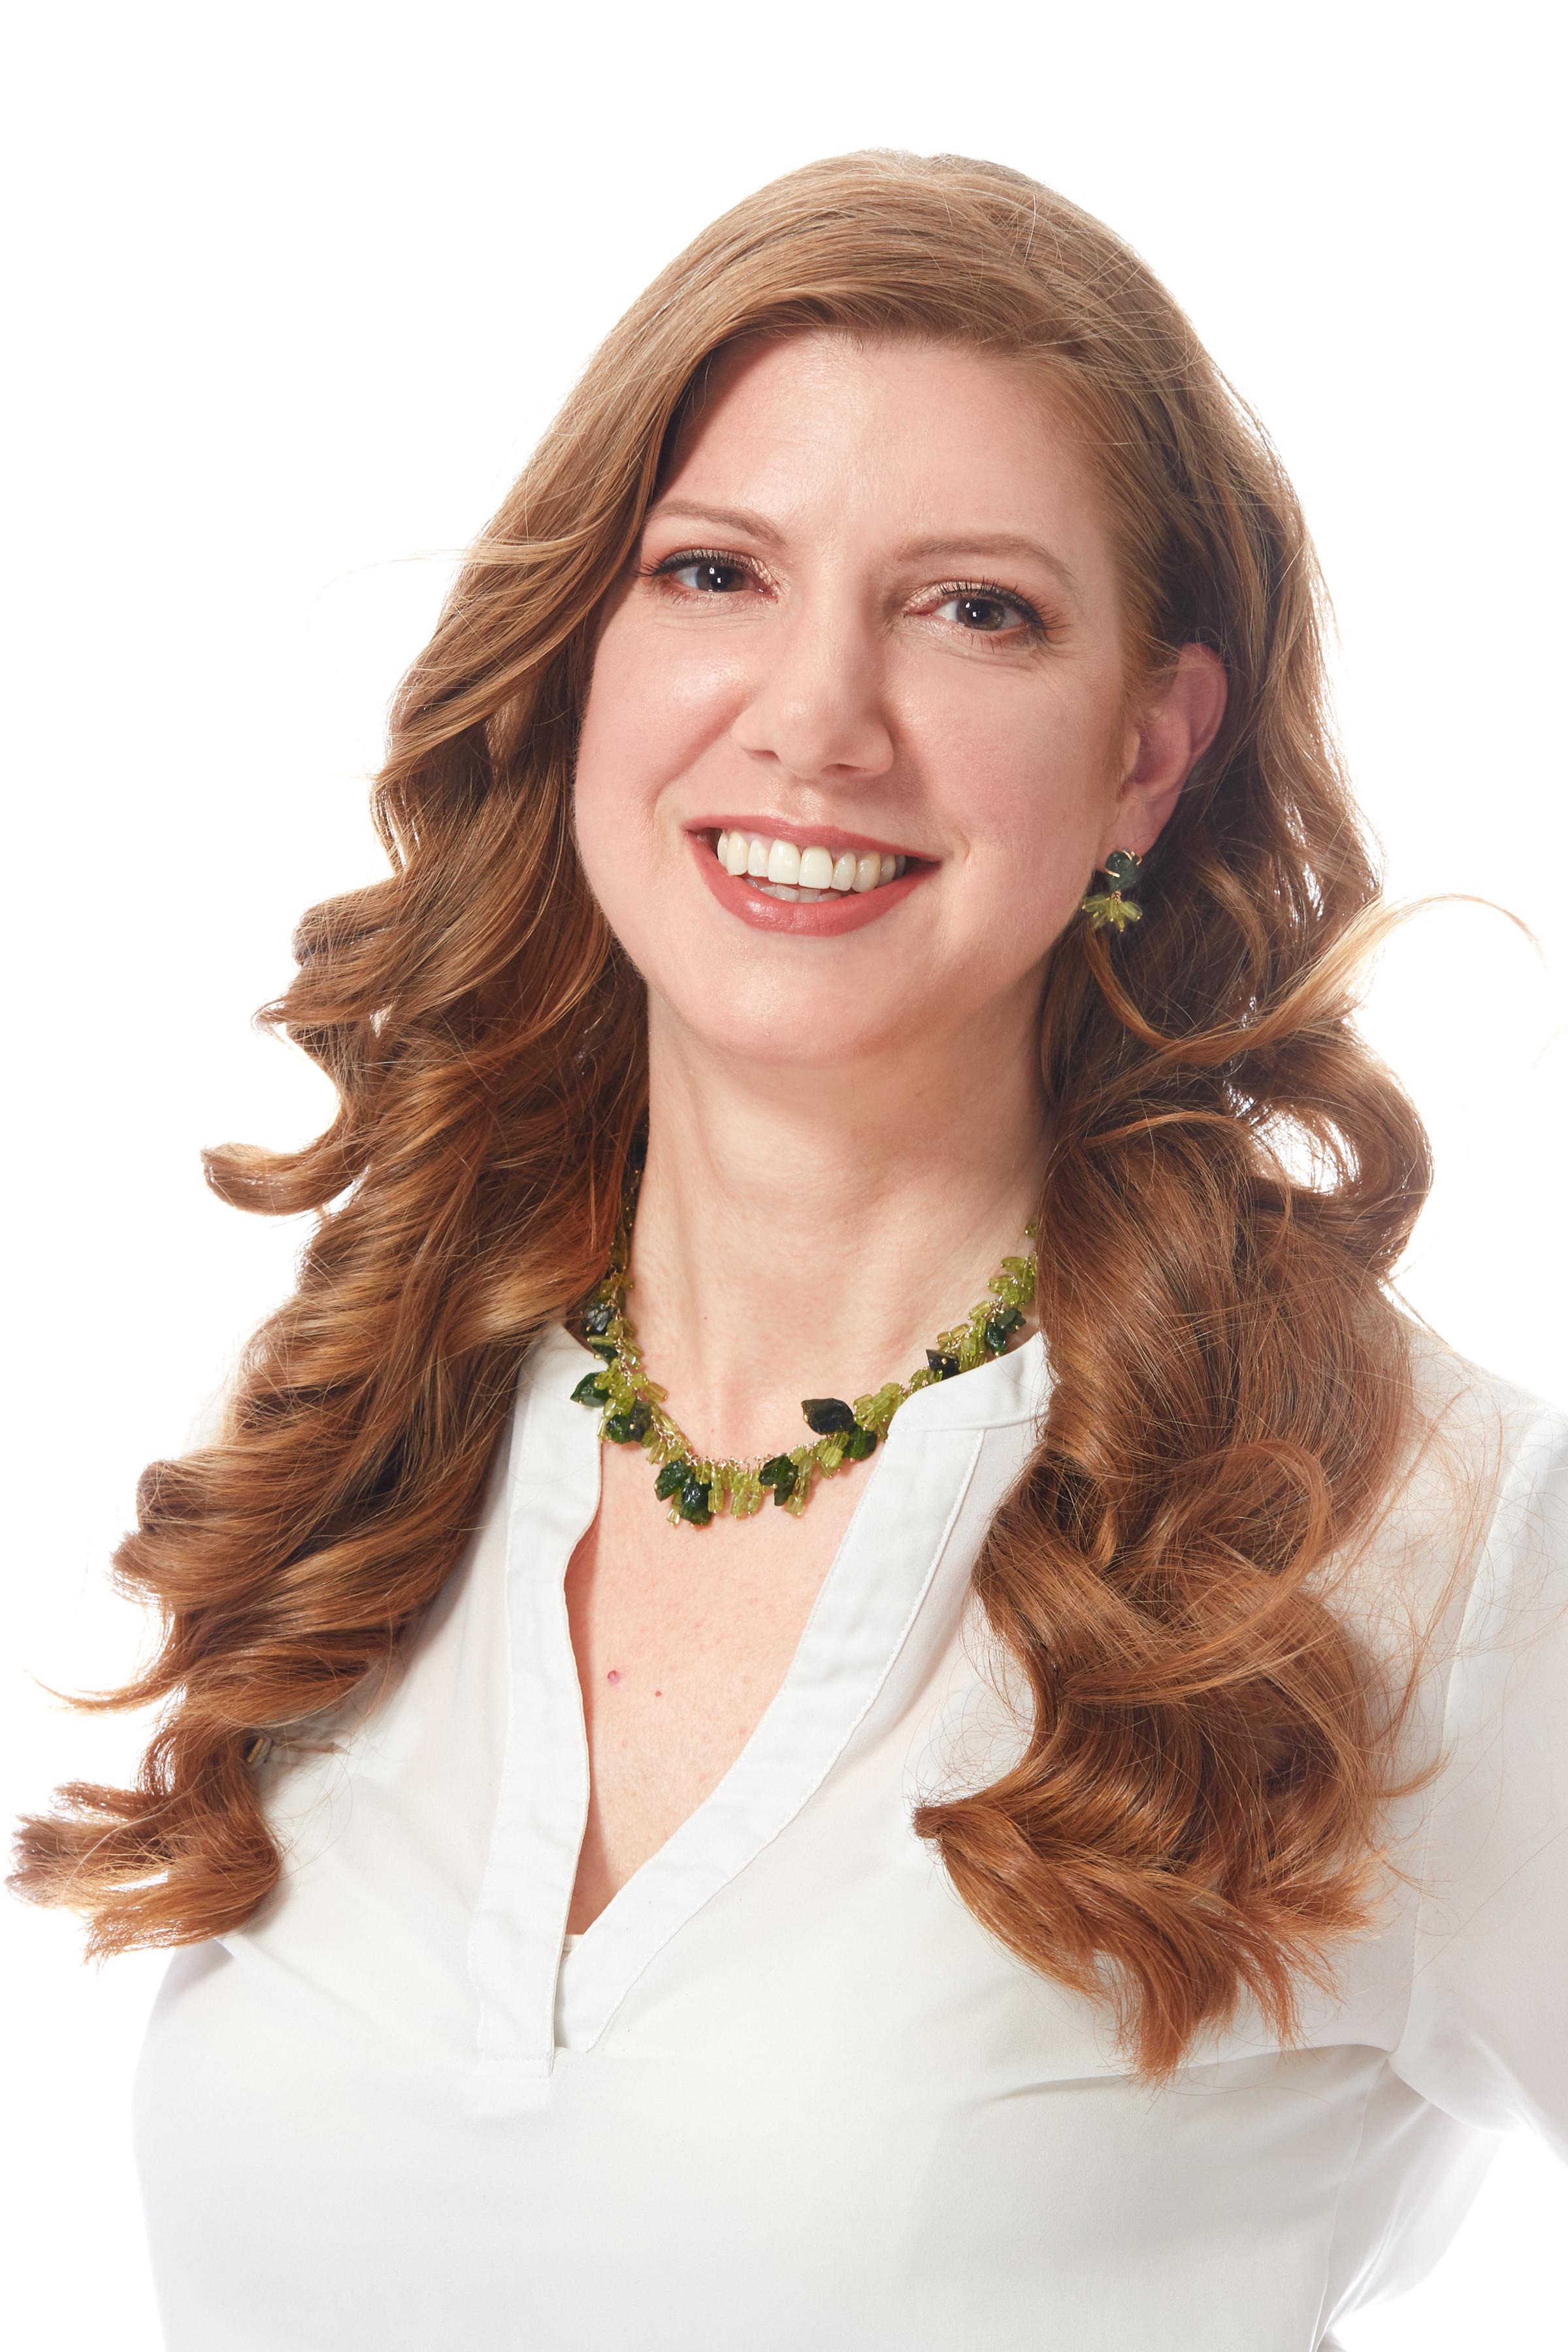 Michelle Pajak-Reynolds